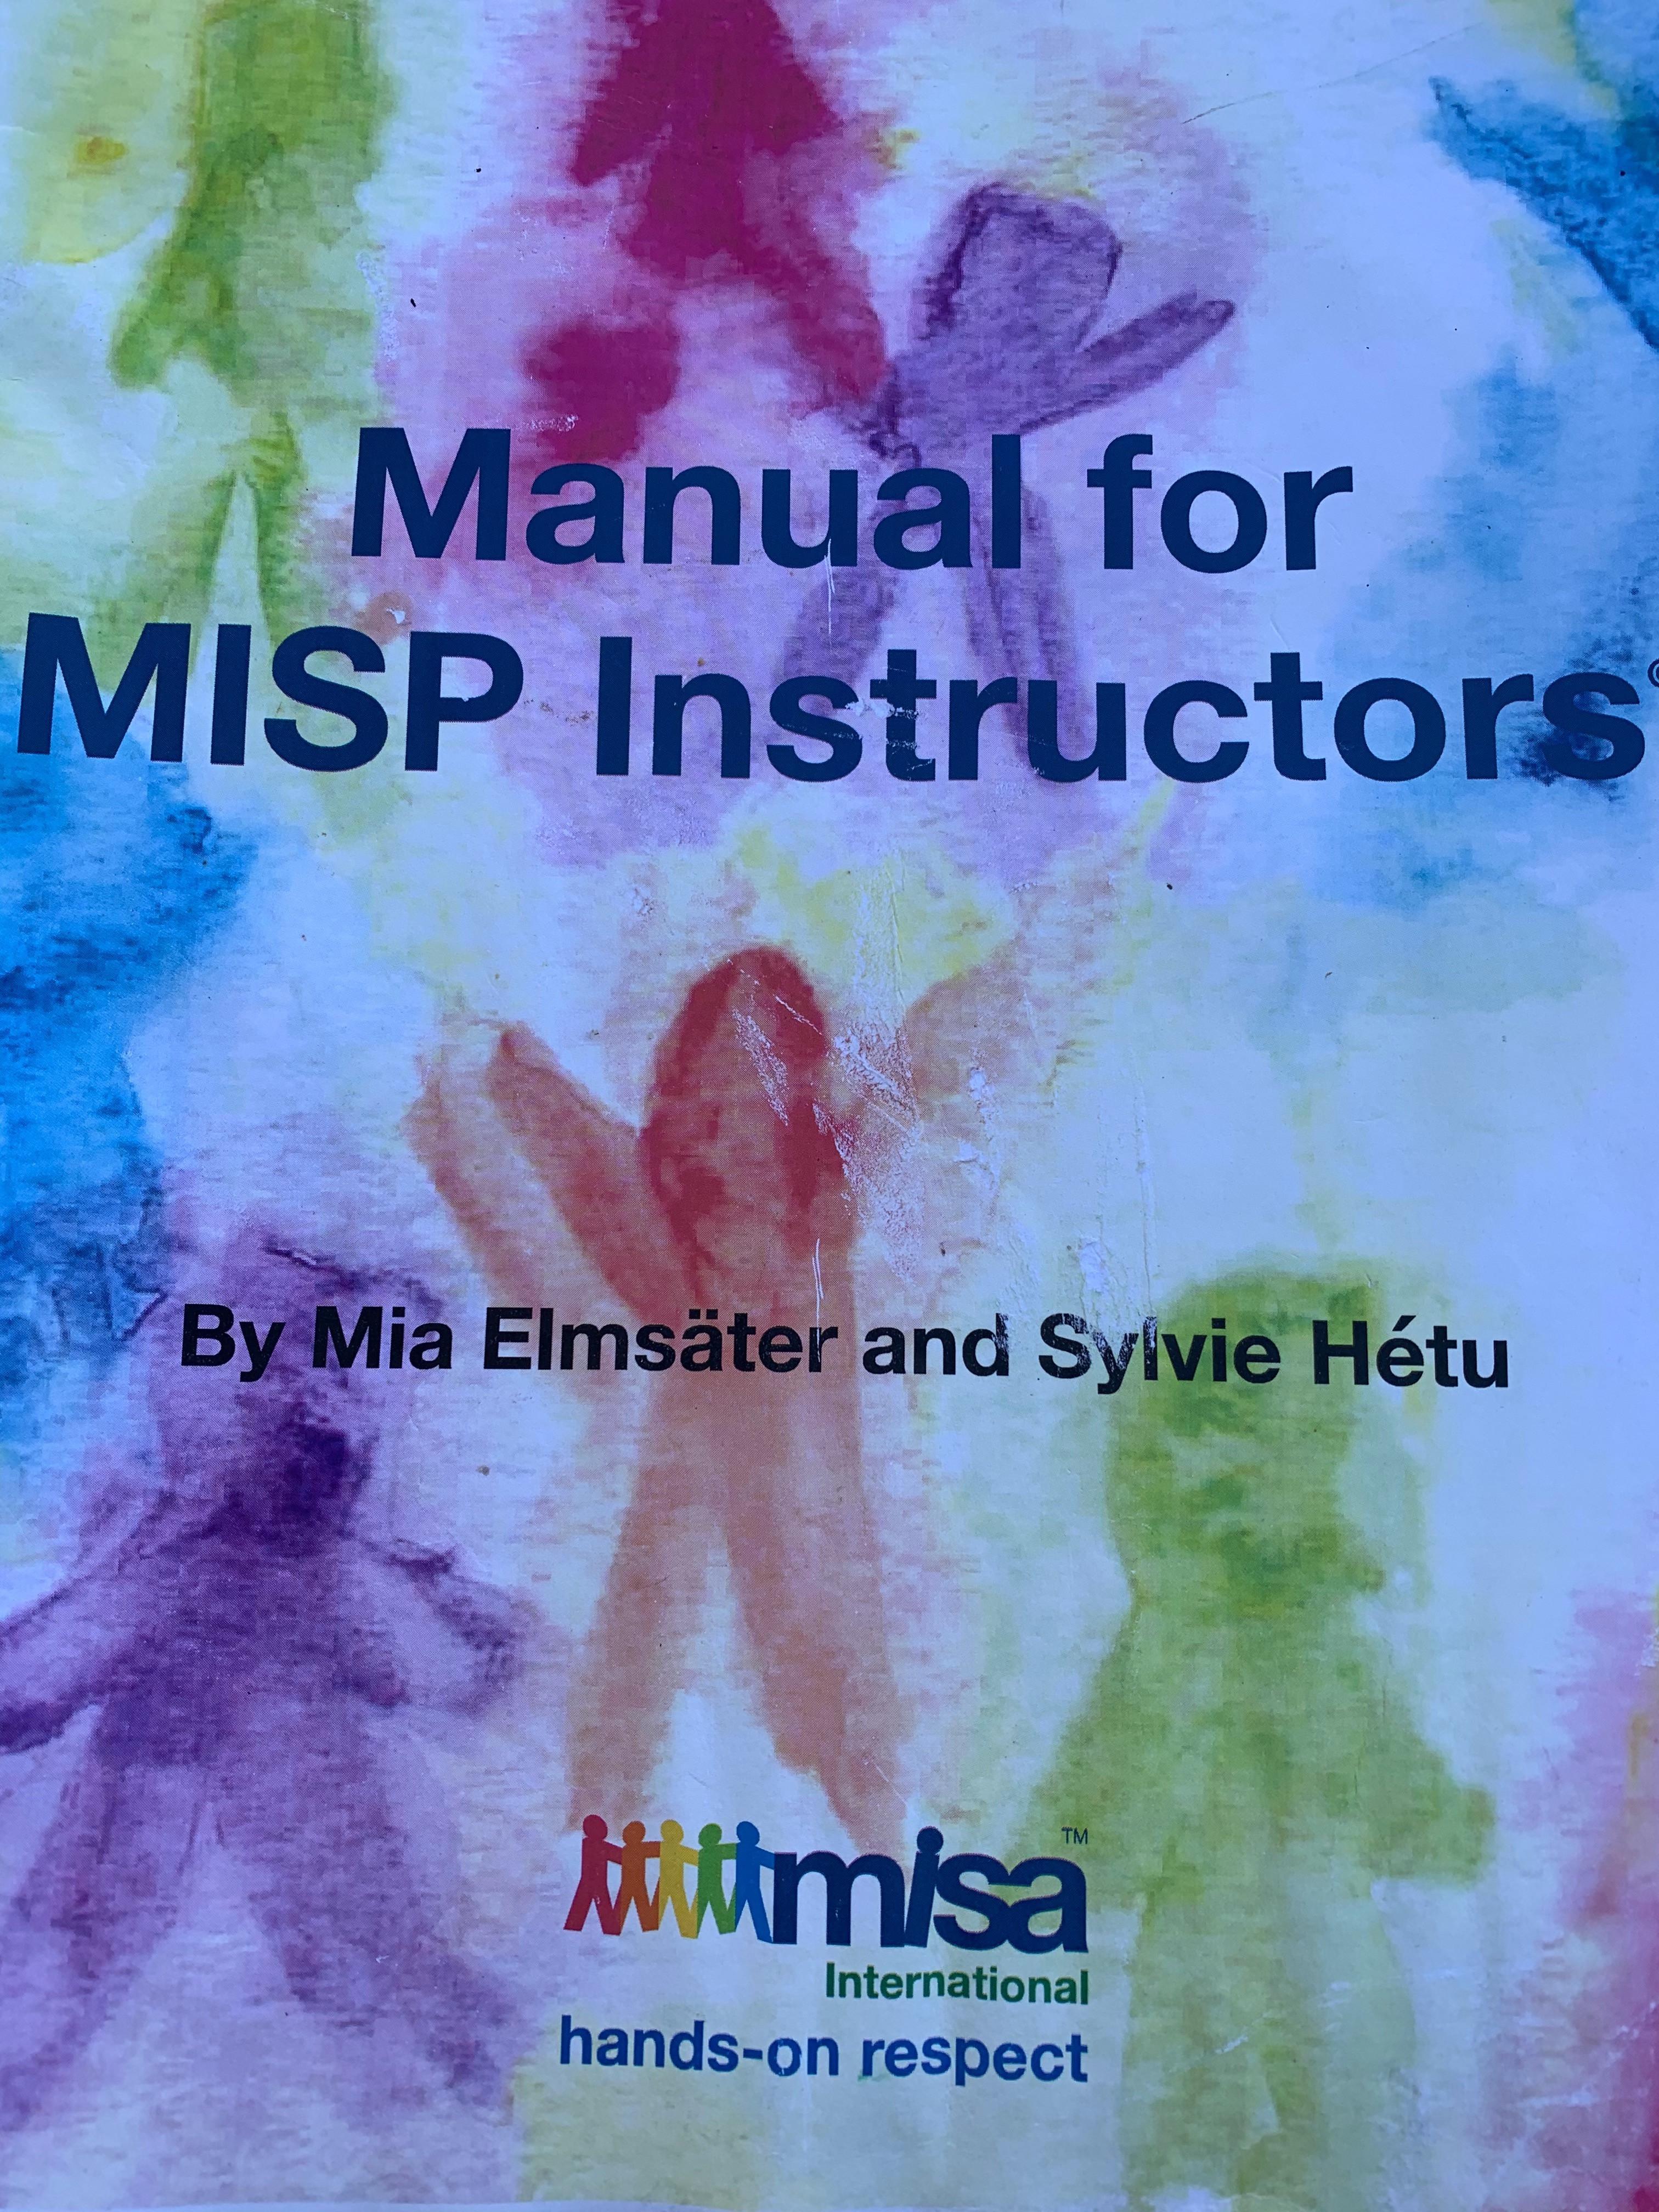 MISP Parent Information Session